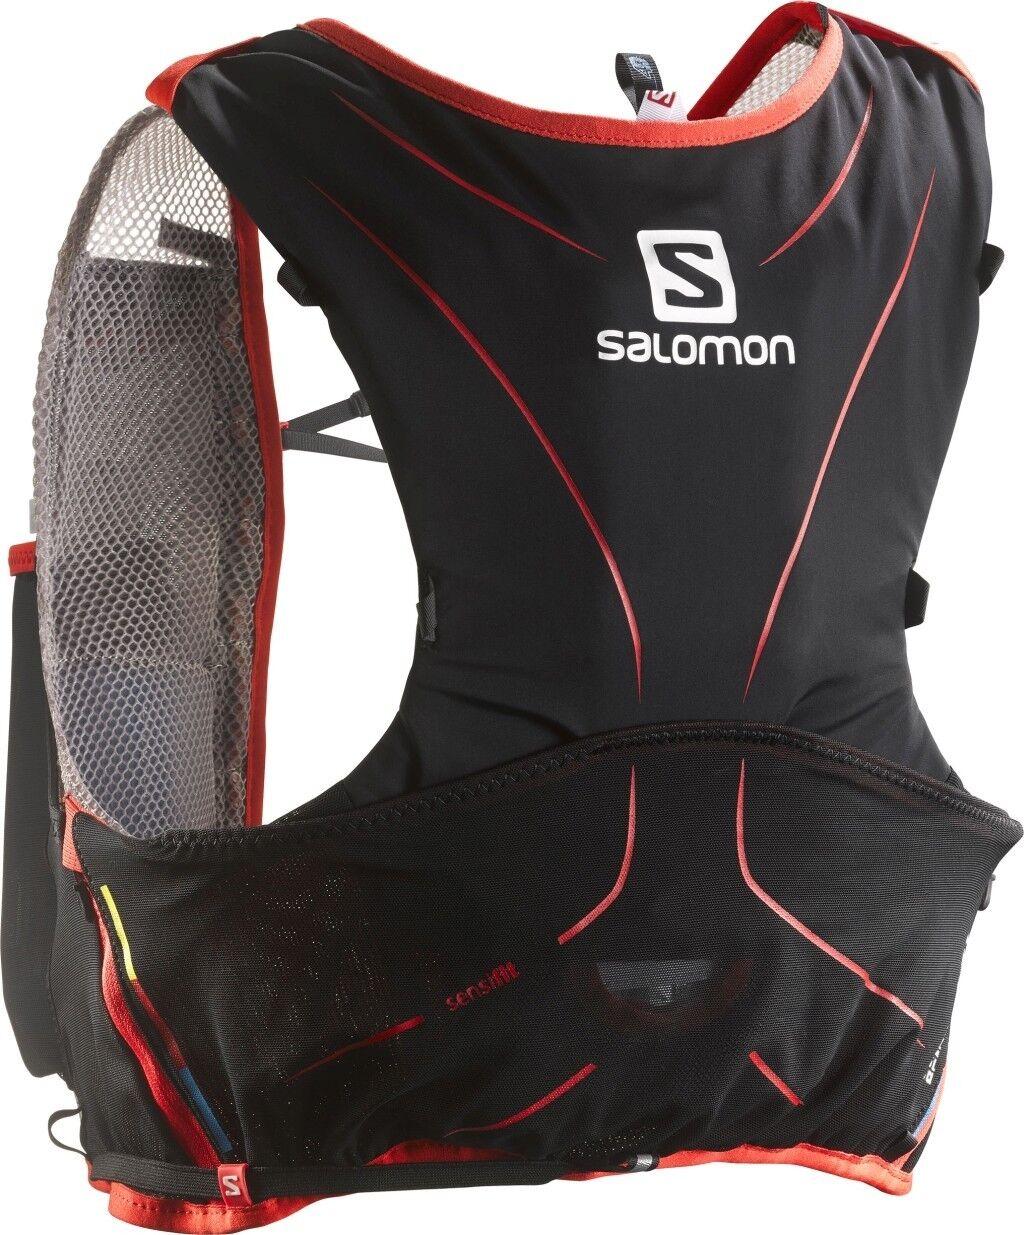 Salomon S-LAB Advanced Advanced Advanced Skin 5Set 809956